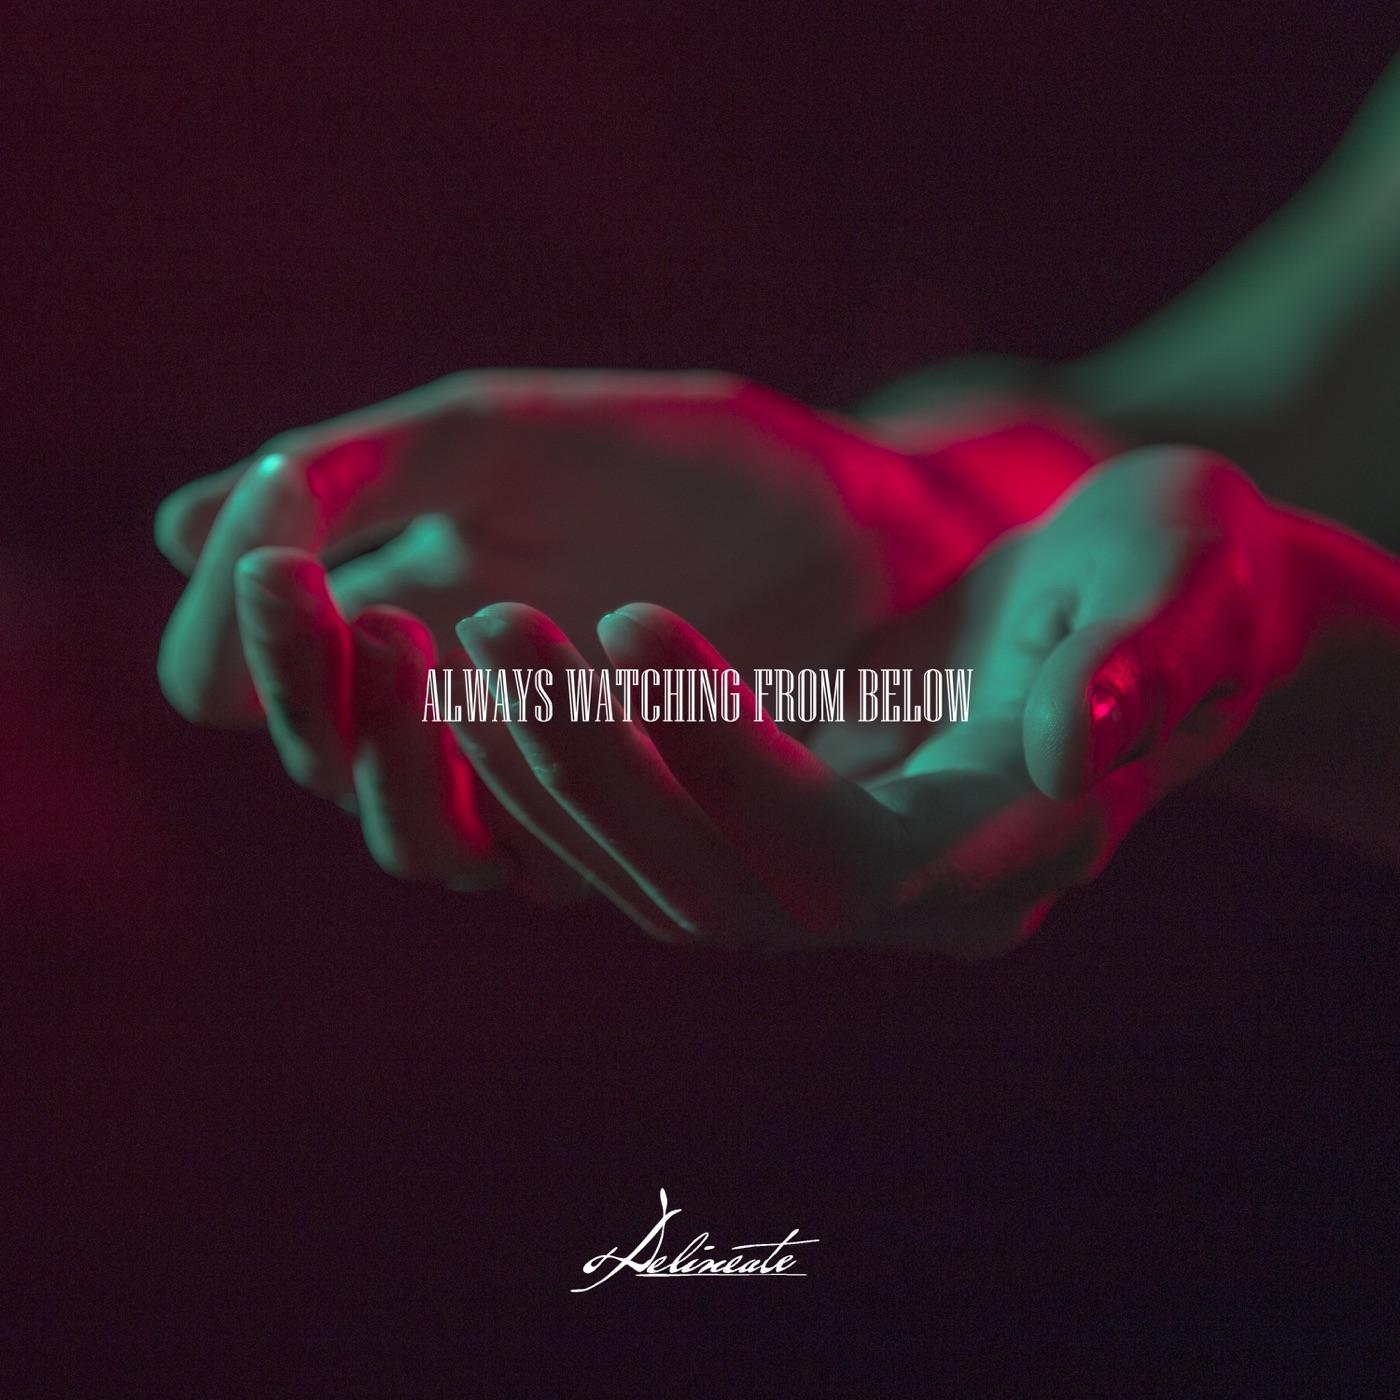 Delineate - Always Watching From Below [Single] (2019)